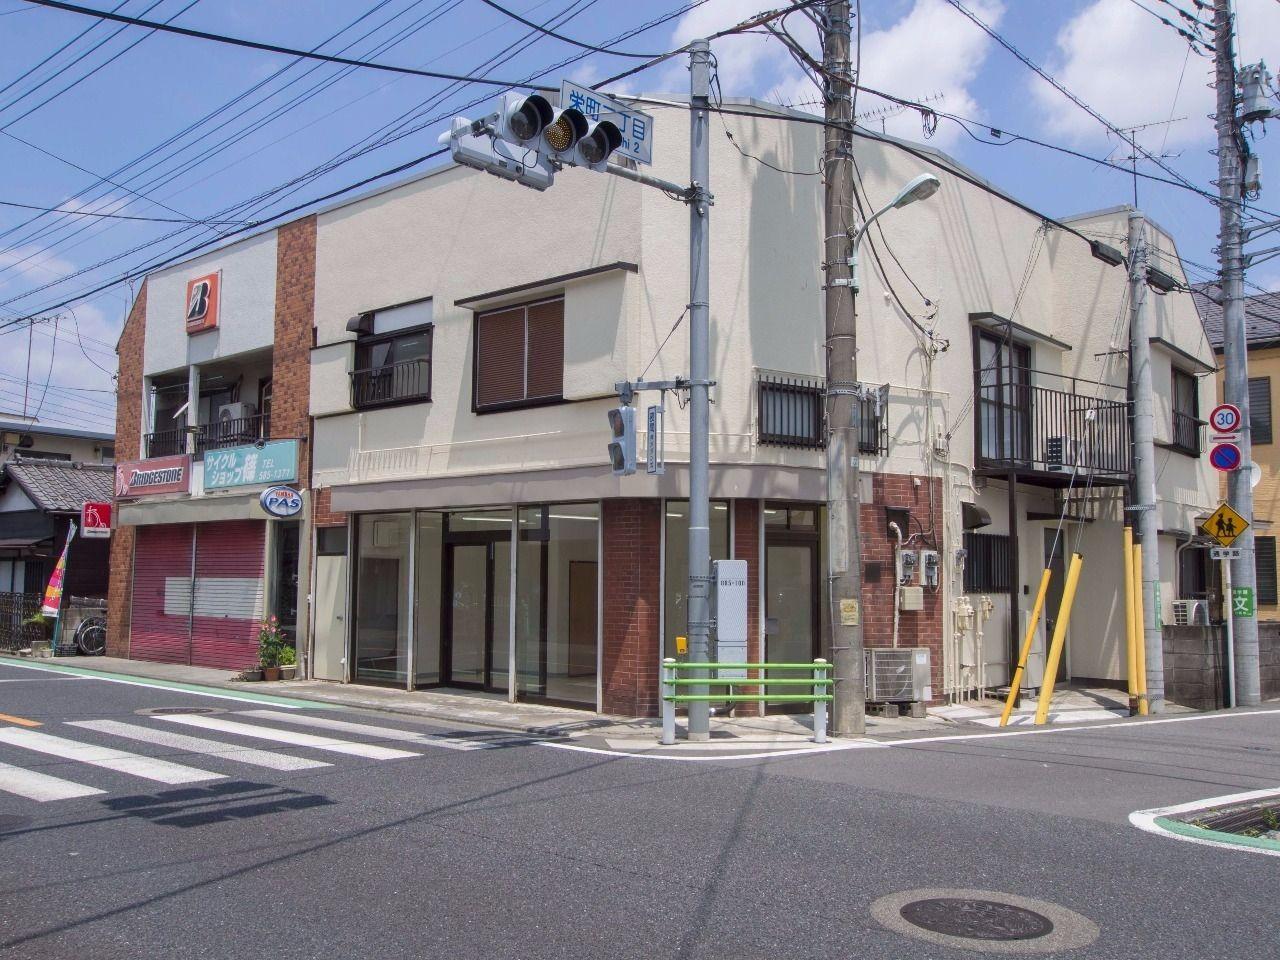 日野駅徒歩6分の便利な立地